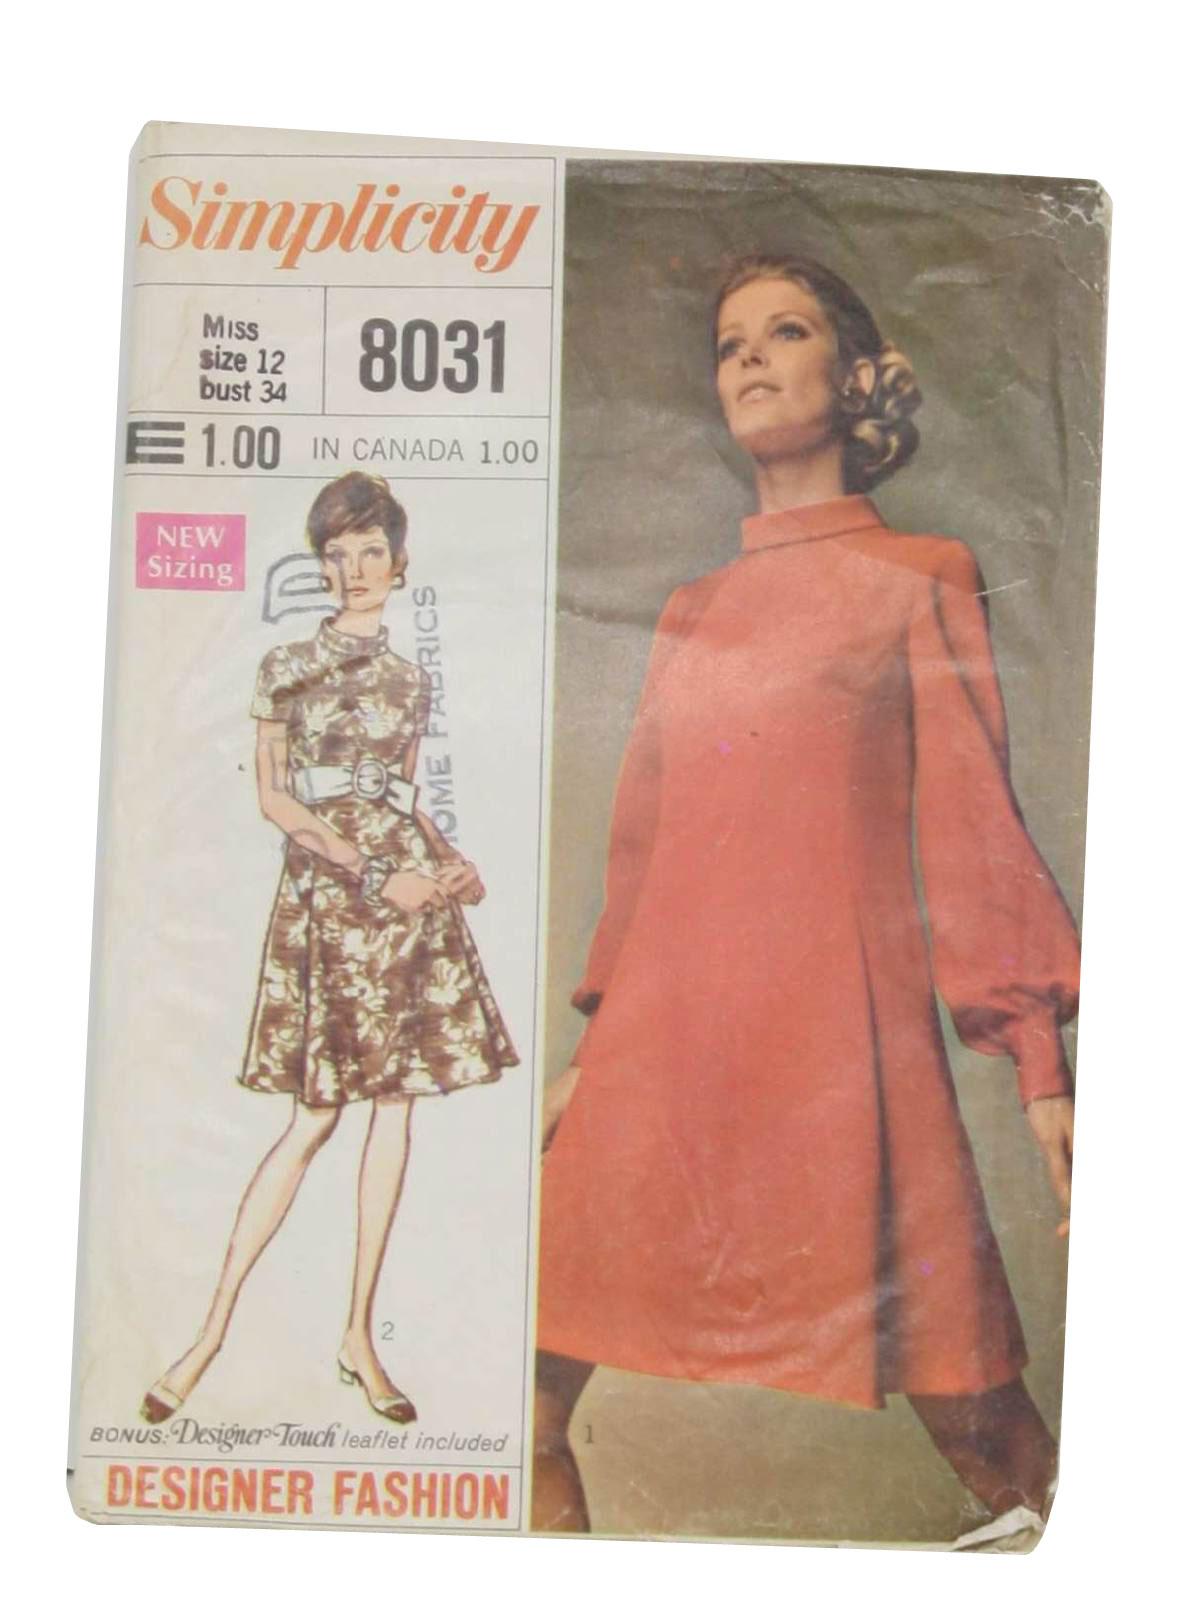 1960s Dress Patterns Interesting Decorating Ideas